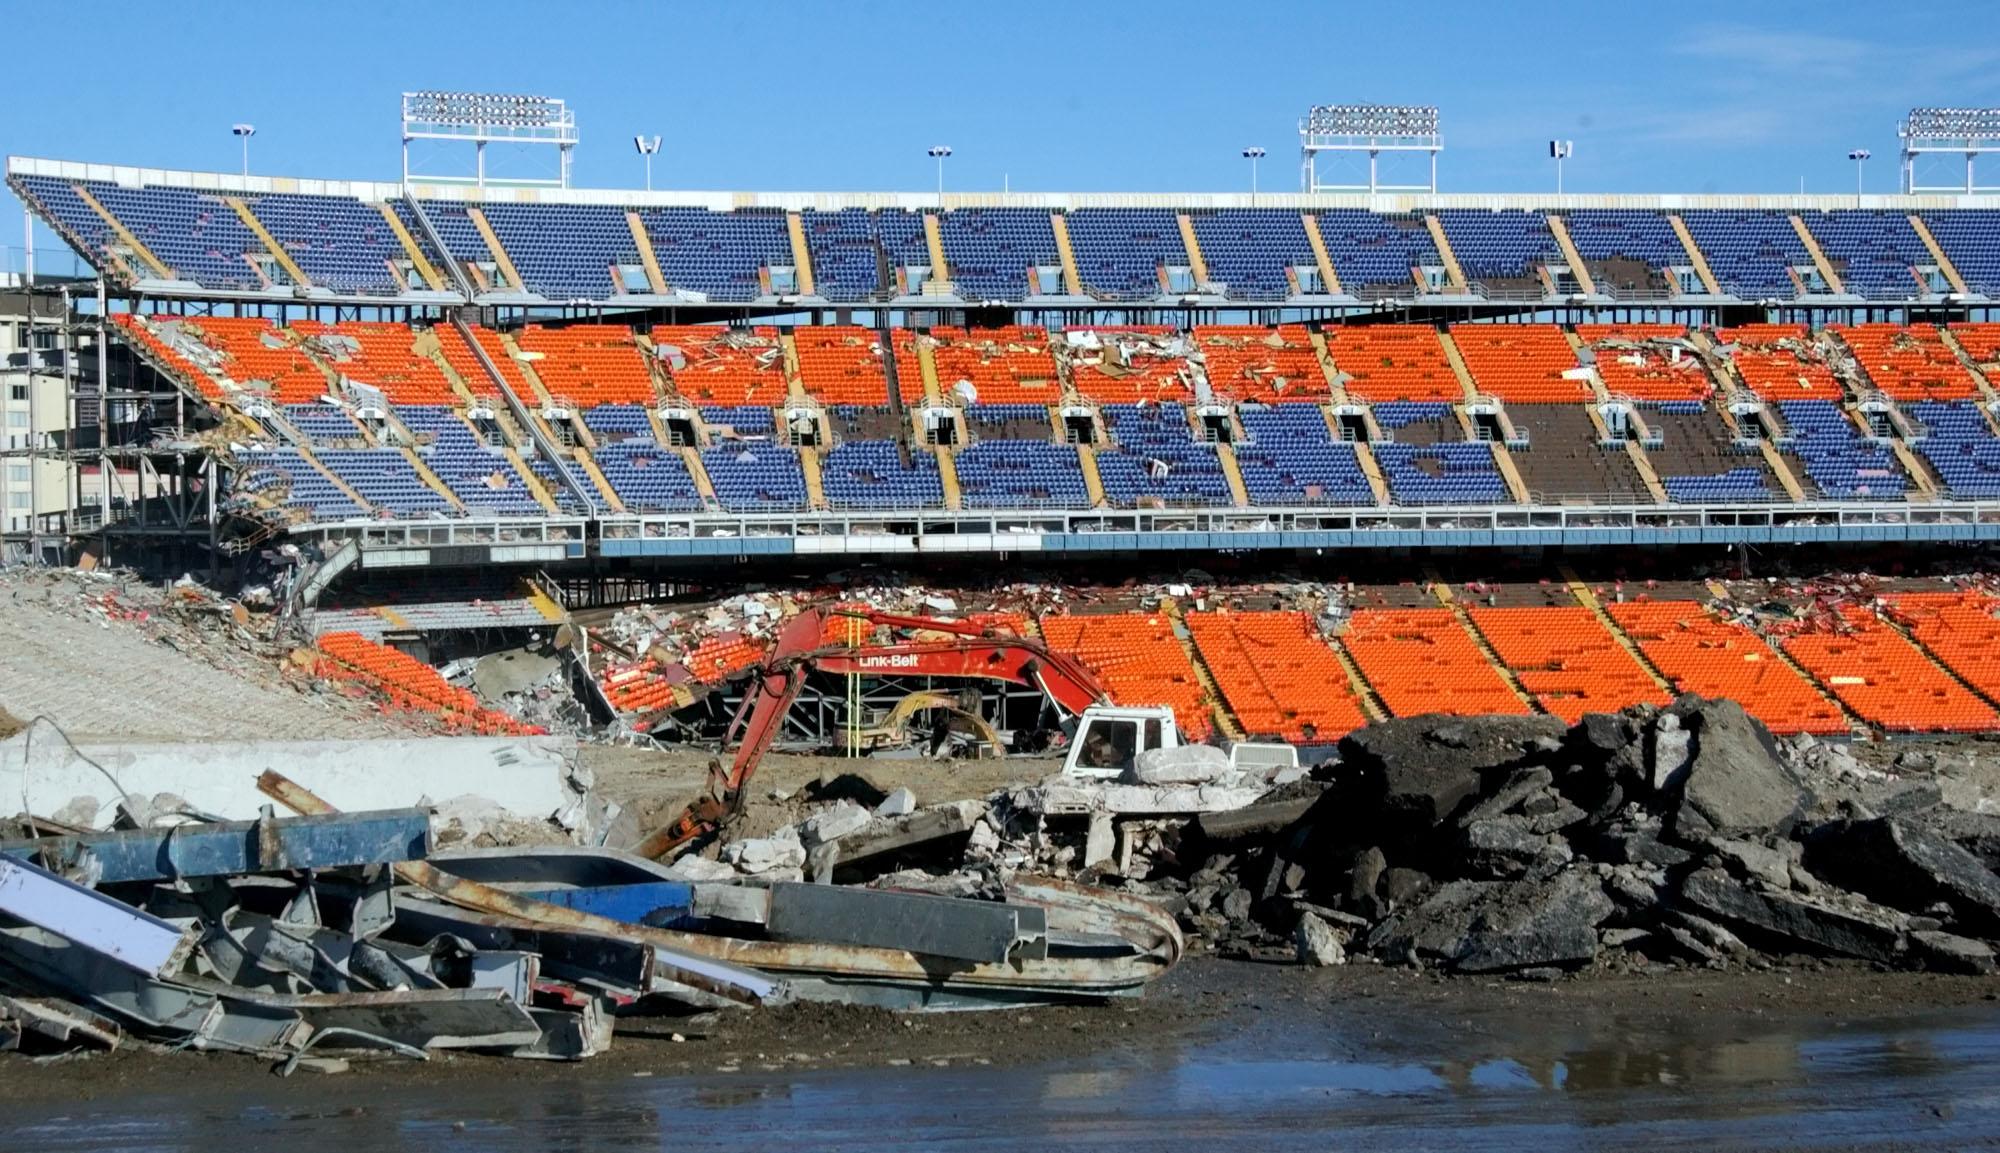 Photo: Mile High Stadium demolition, 2002 (AP Photo)